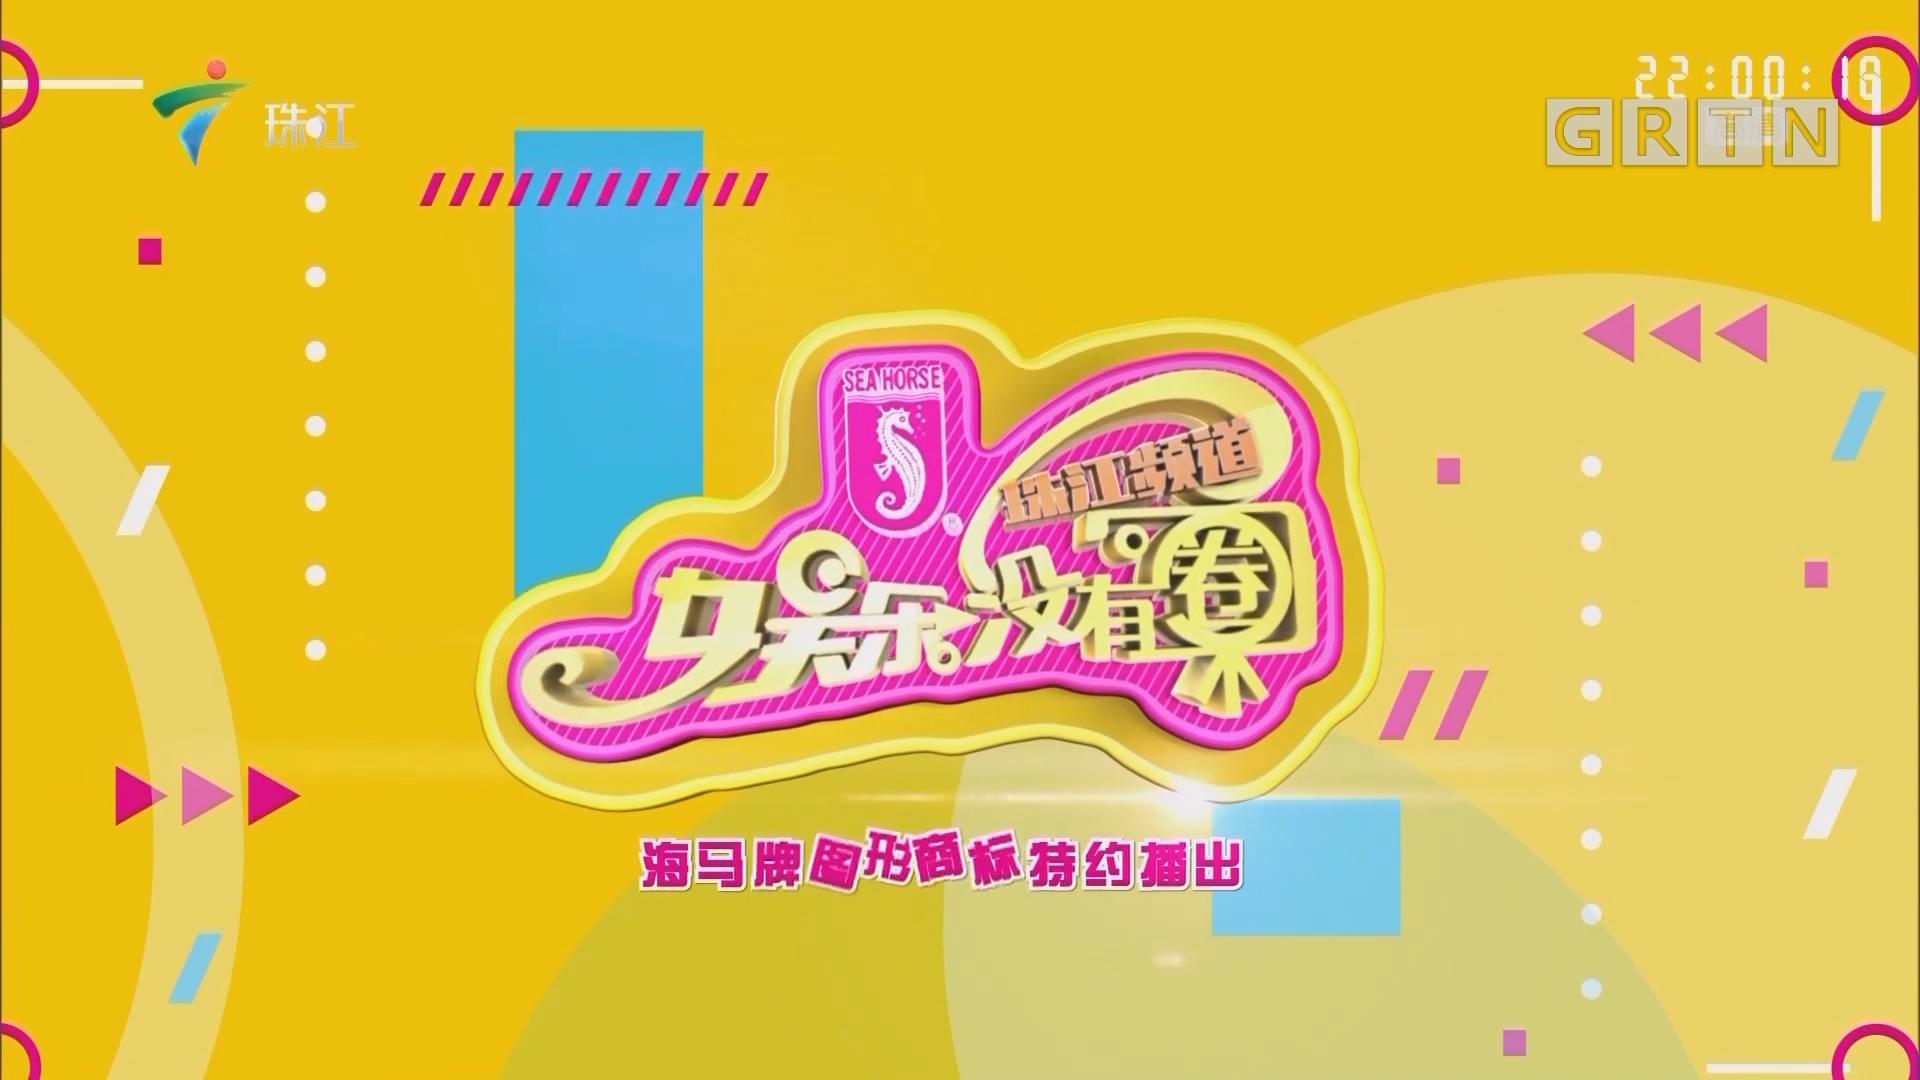 [HD][2018-10-25]娱乐没有圈:张雨绮——随心而动,霸气外泄的奇女子